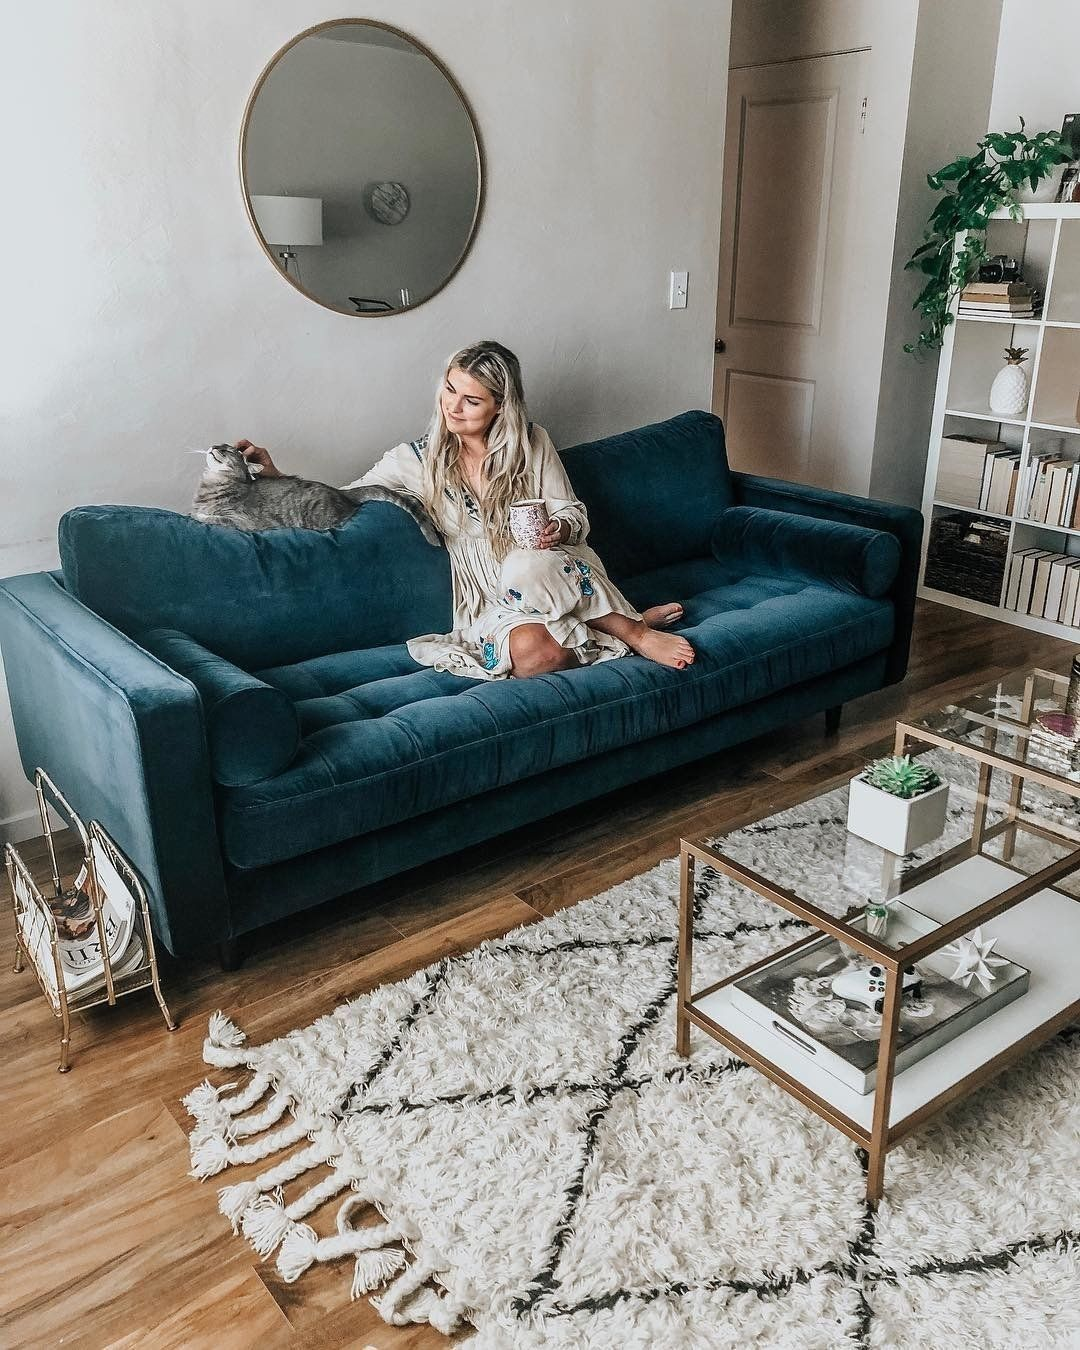 27 Splendidly Comfortable Floor Level Sofas To Enjoy Floor Couch